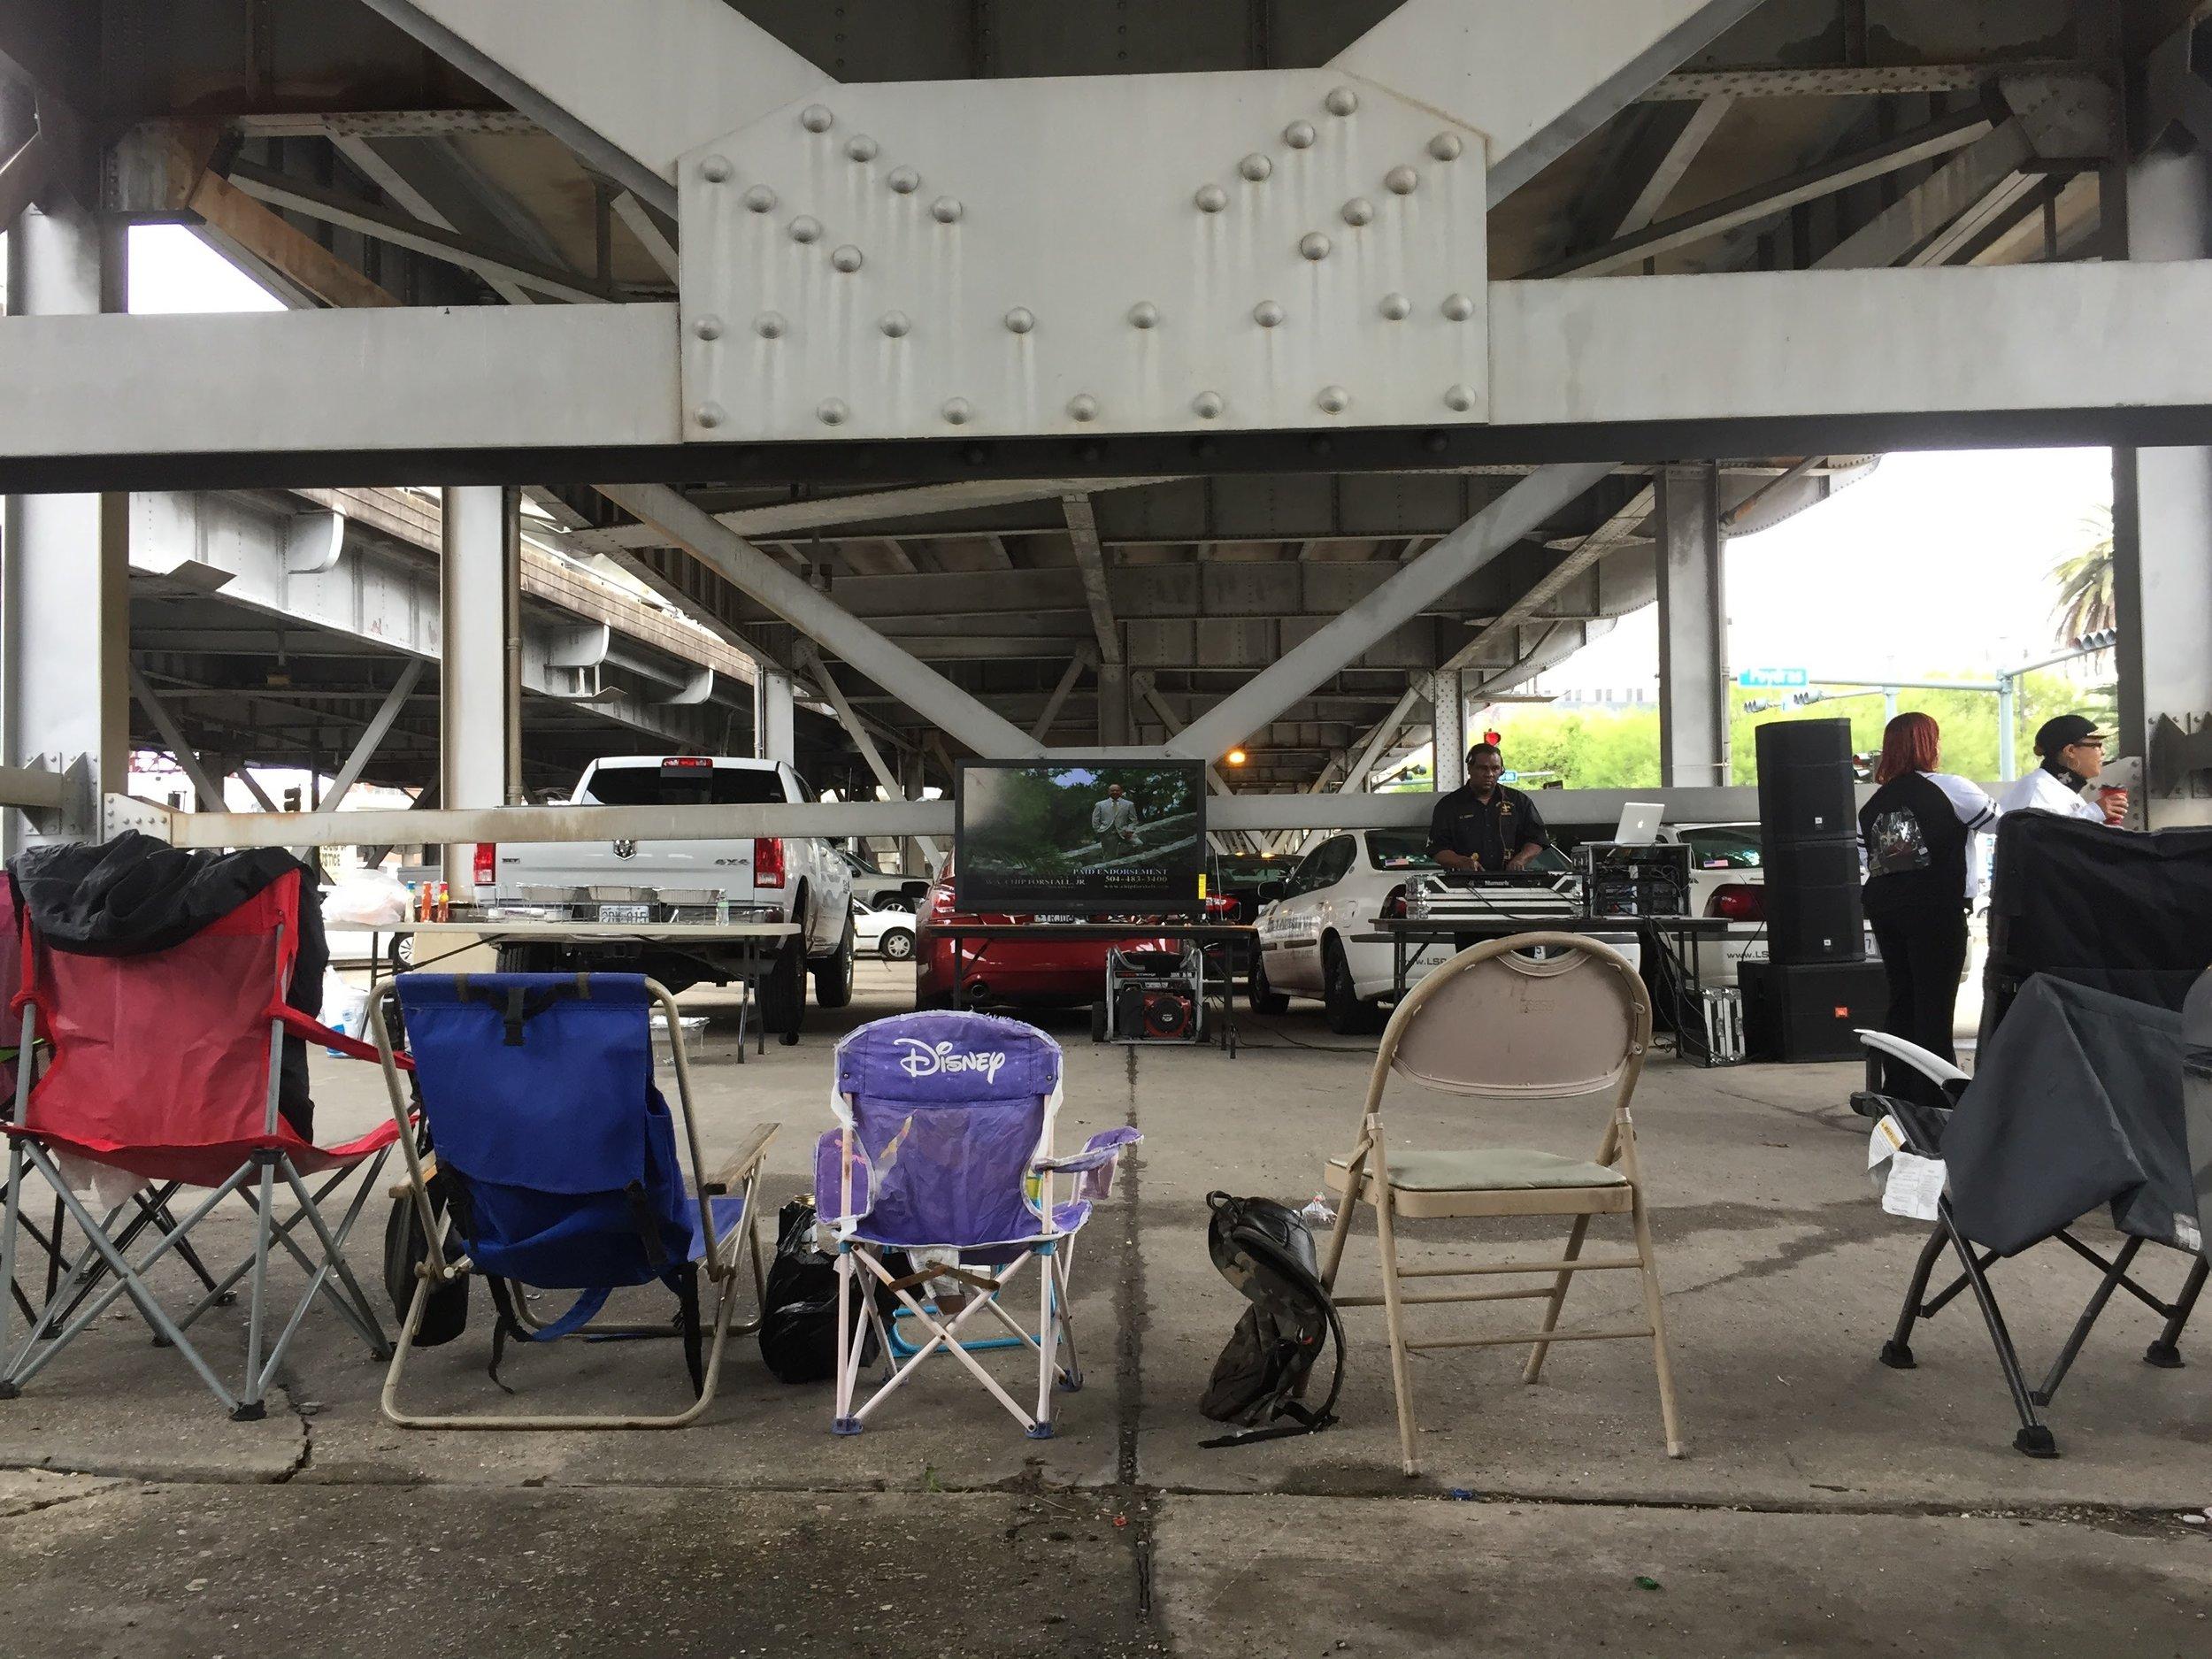 Superdome (New Orleans, LA)